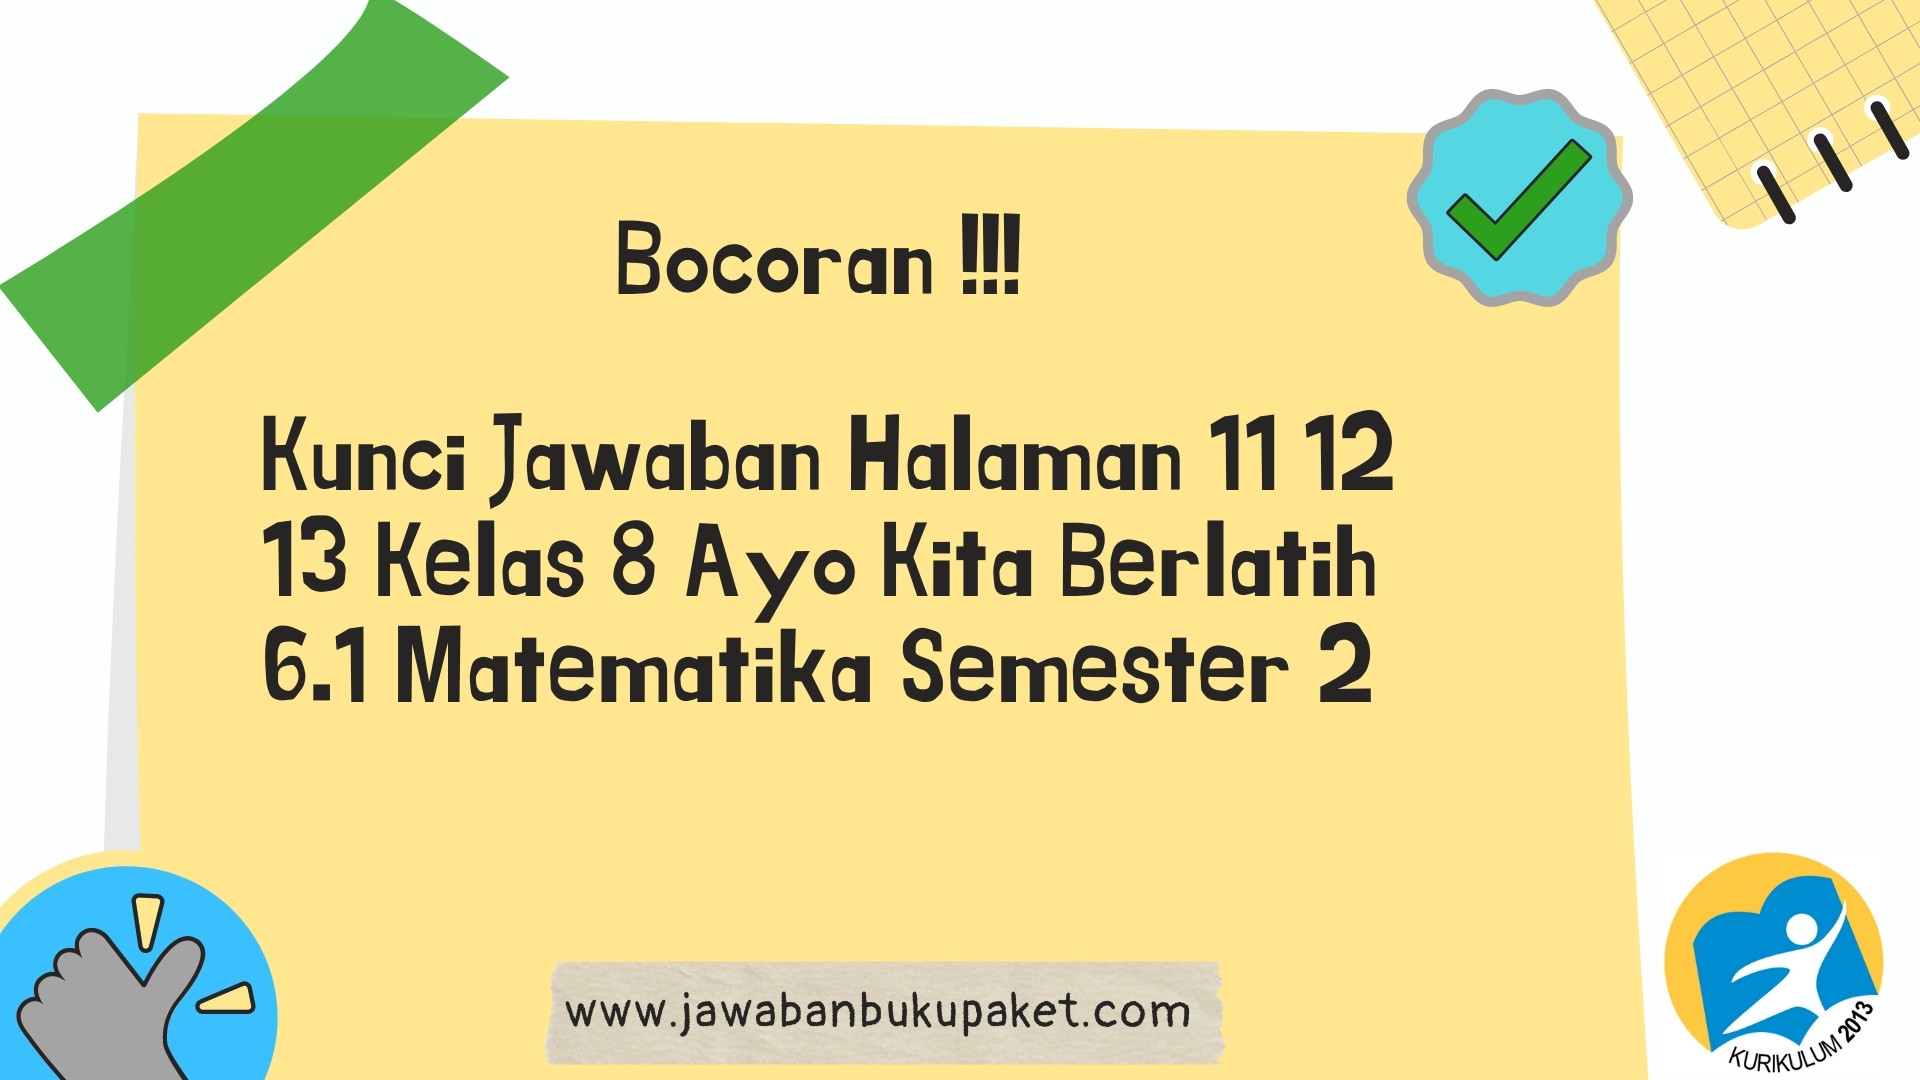 Kunci Jawaban Halaman 11 12 13 Kelas 8 Ayo Kita Berlatih 6.1 Matematika Semester 2 www.jawabanbukupaket.com